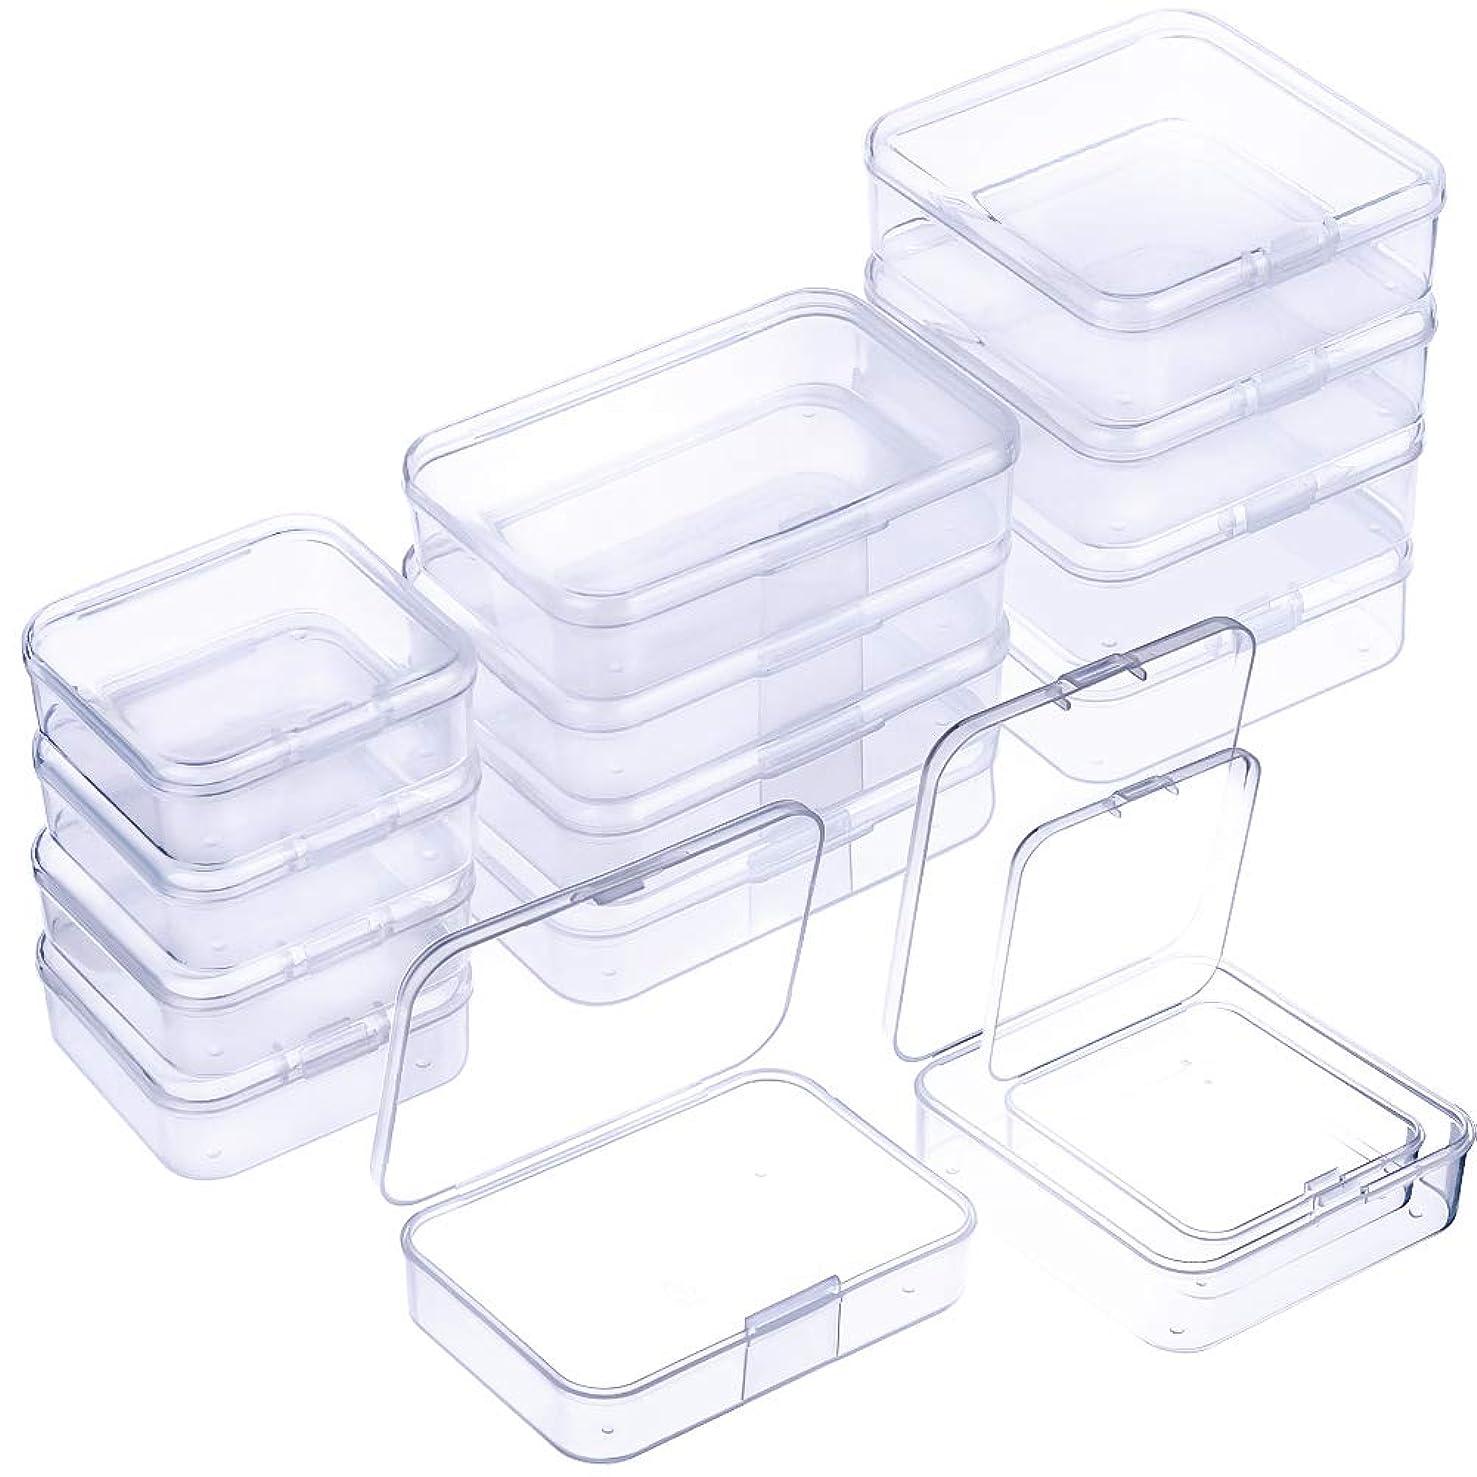 WXJ13 15 Pieces 3 Size Bead Storage Box Plastic Transparent Organizer